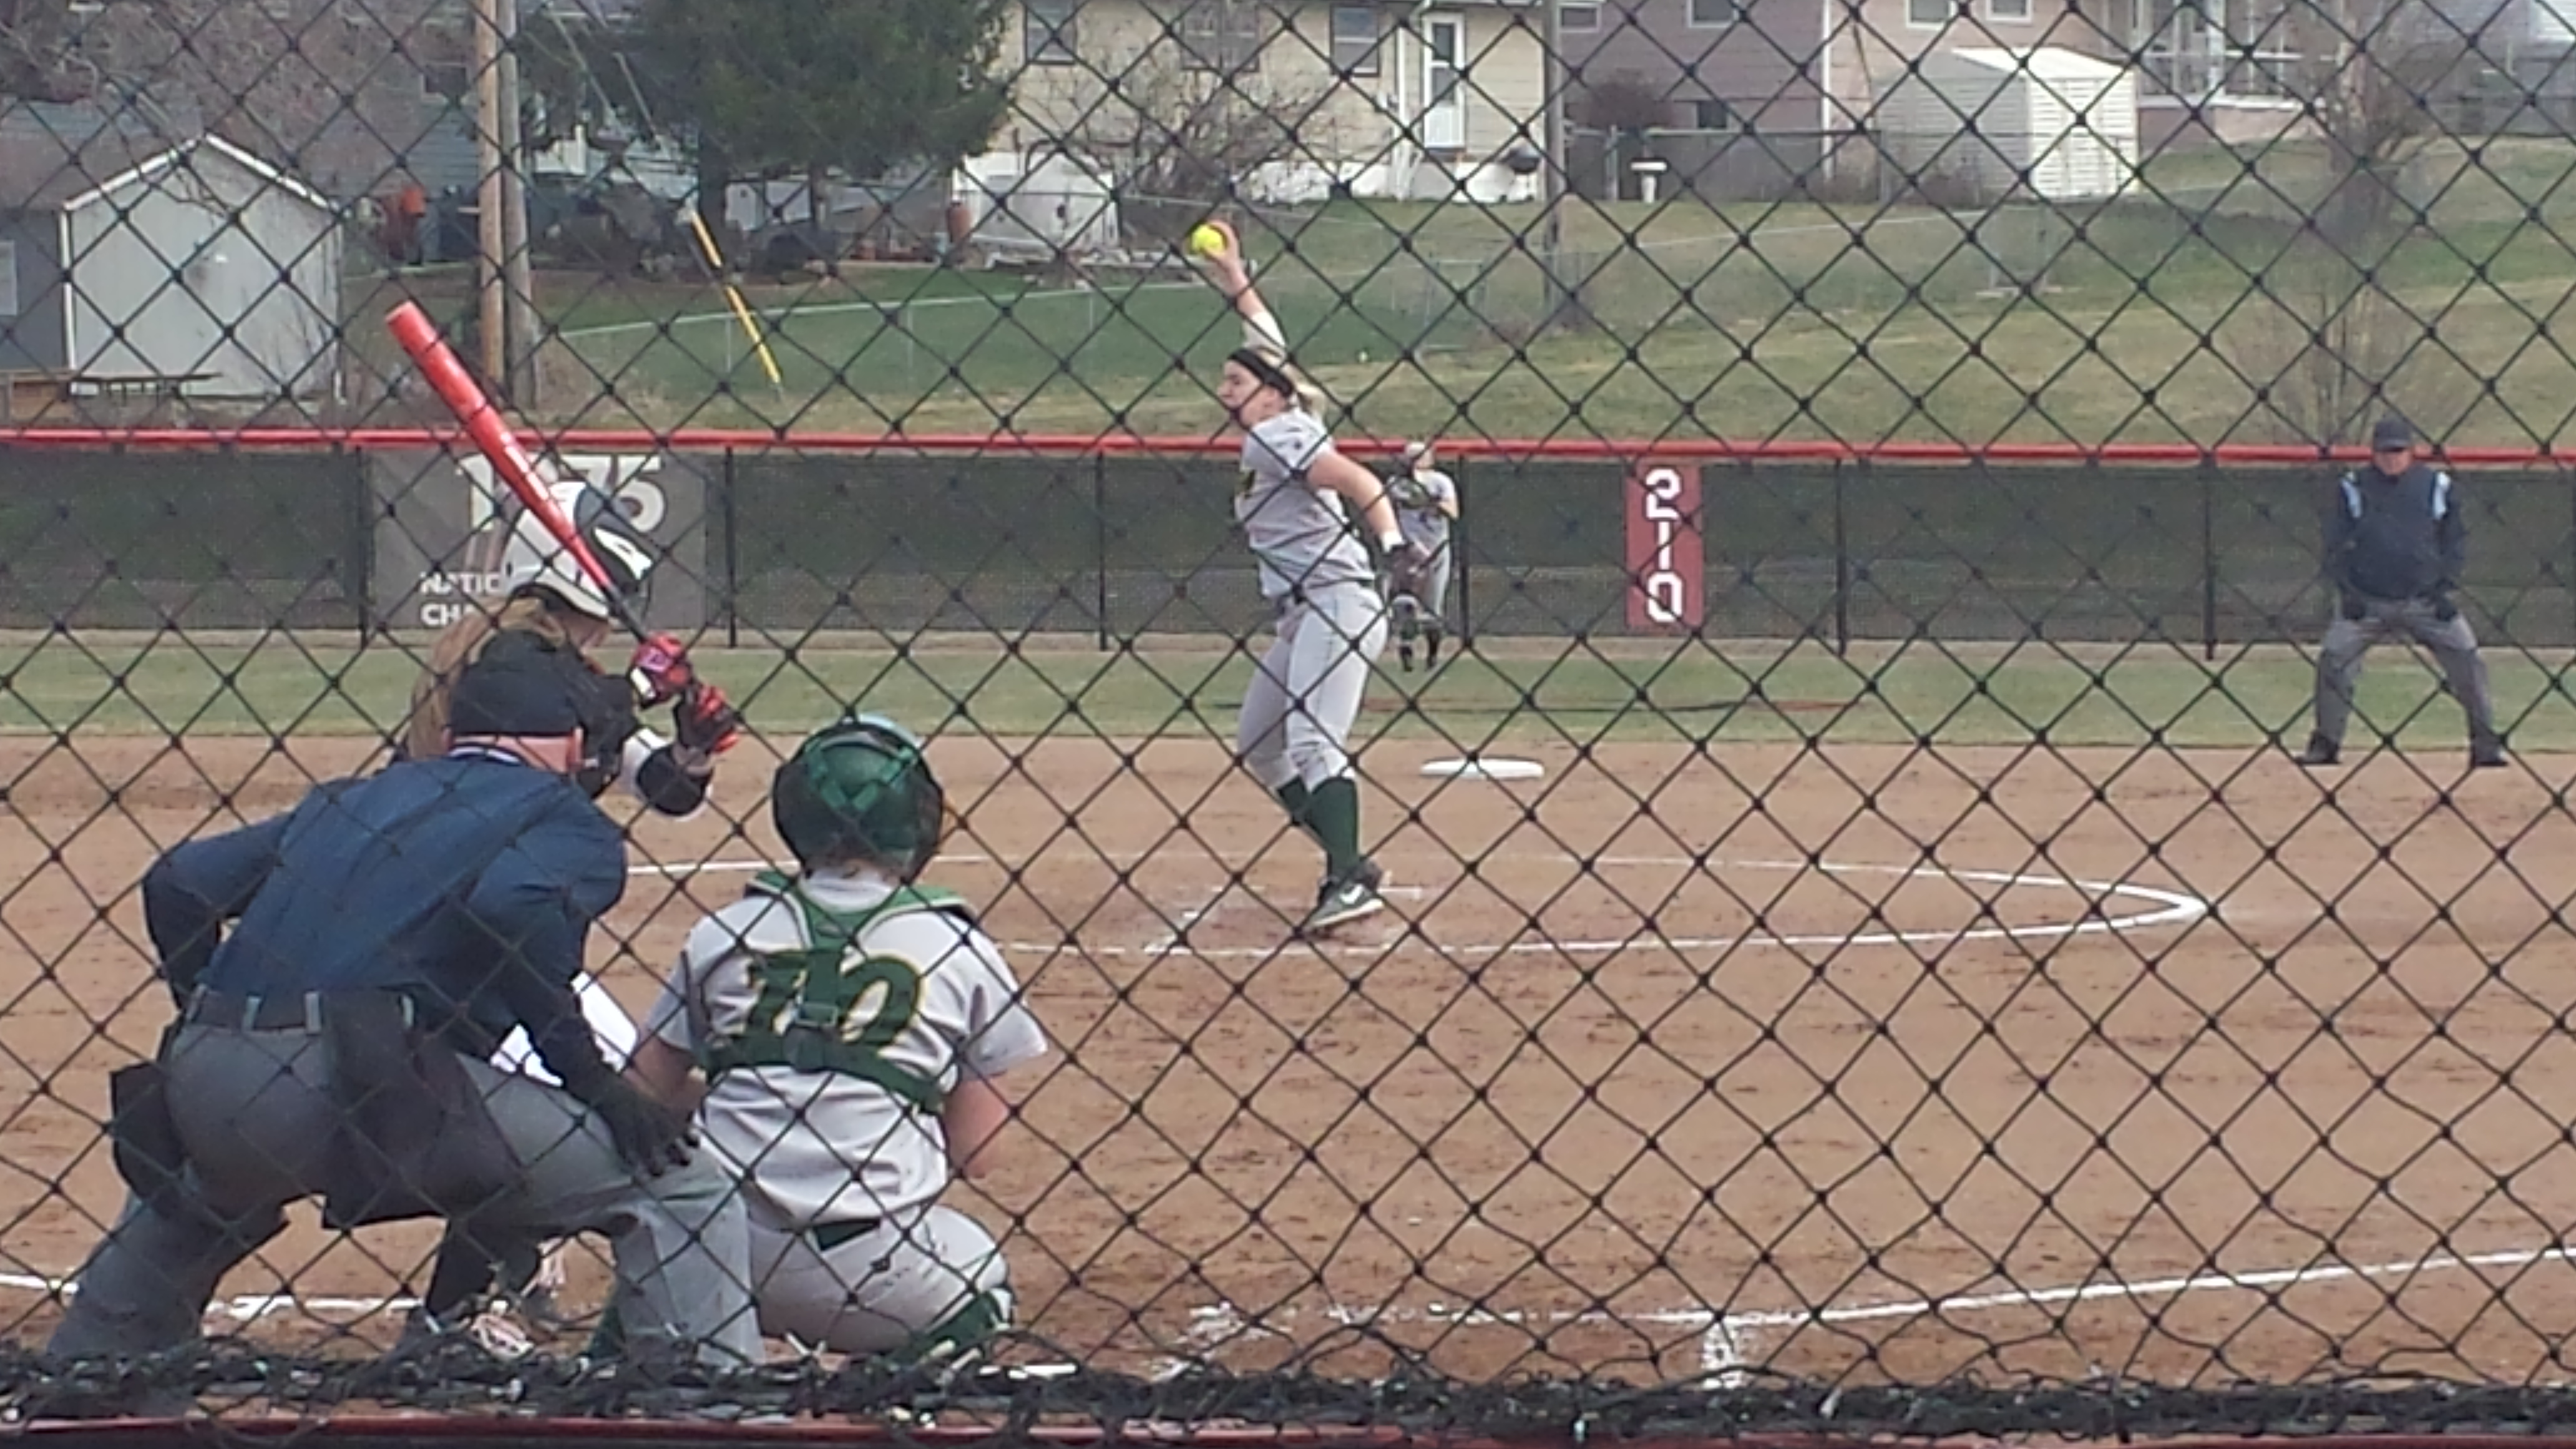 Krista Menke (pitching) made a splash returning home to Nebraska. (Photo Courtesy Brandon McDermott)